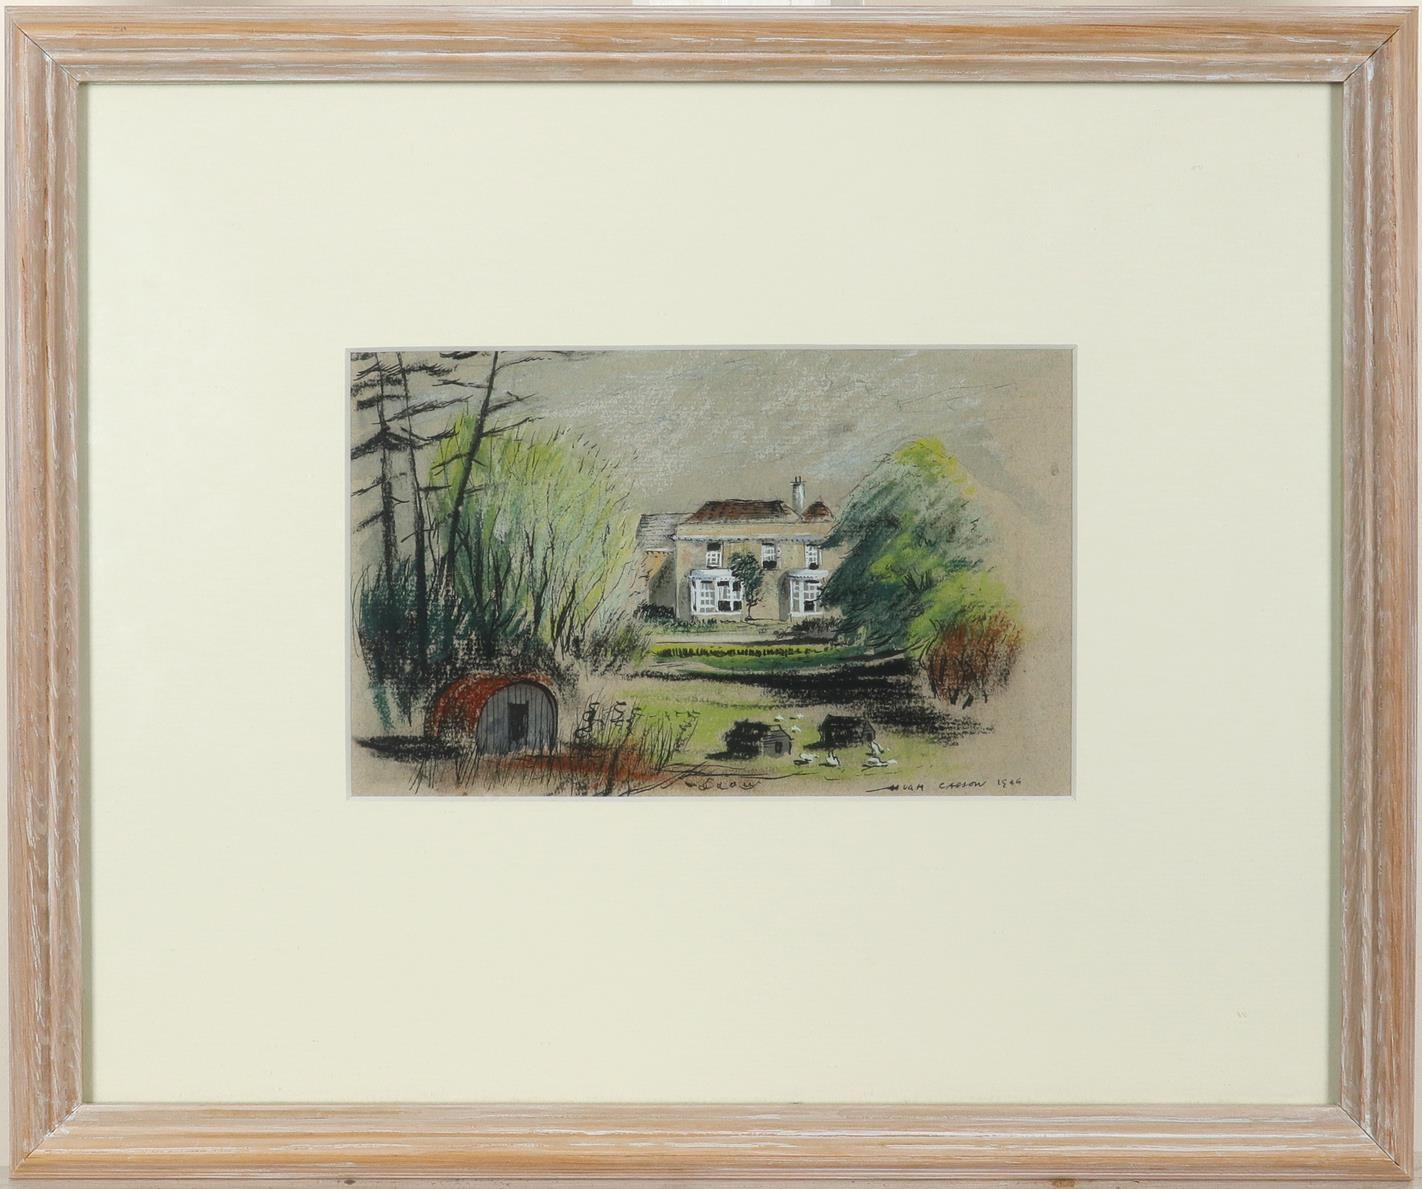 ‡Sir Hugh Casson CH, KKCVO, PRA, RDI (1910-1999) Anderson shelter; Broadwalk, Rivington Garden - Image 3 of 6